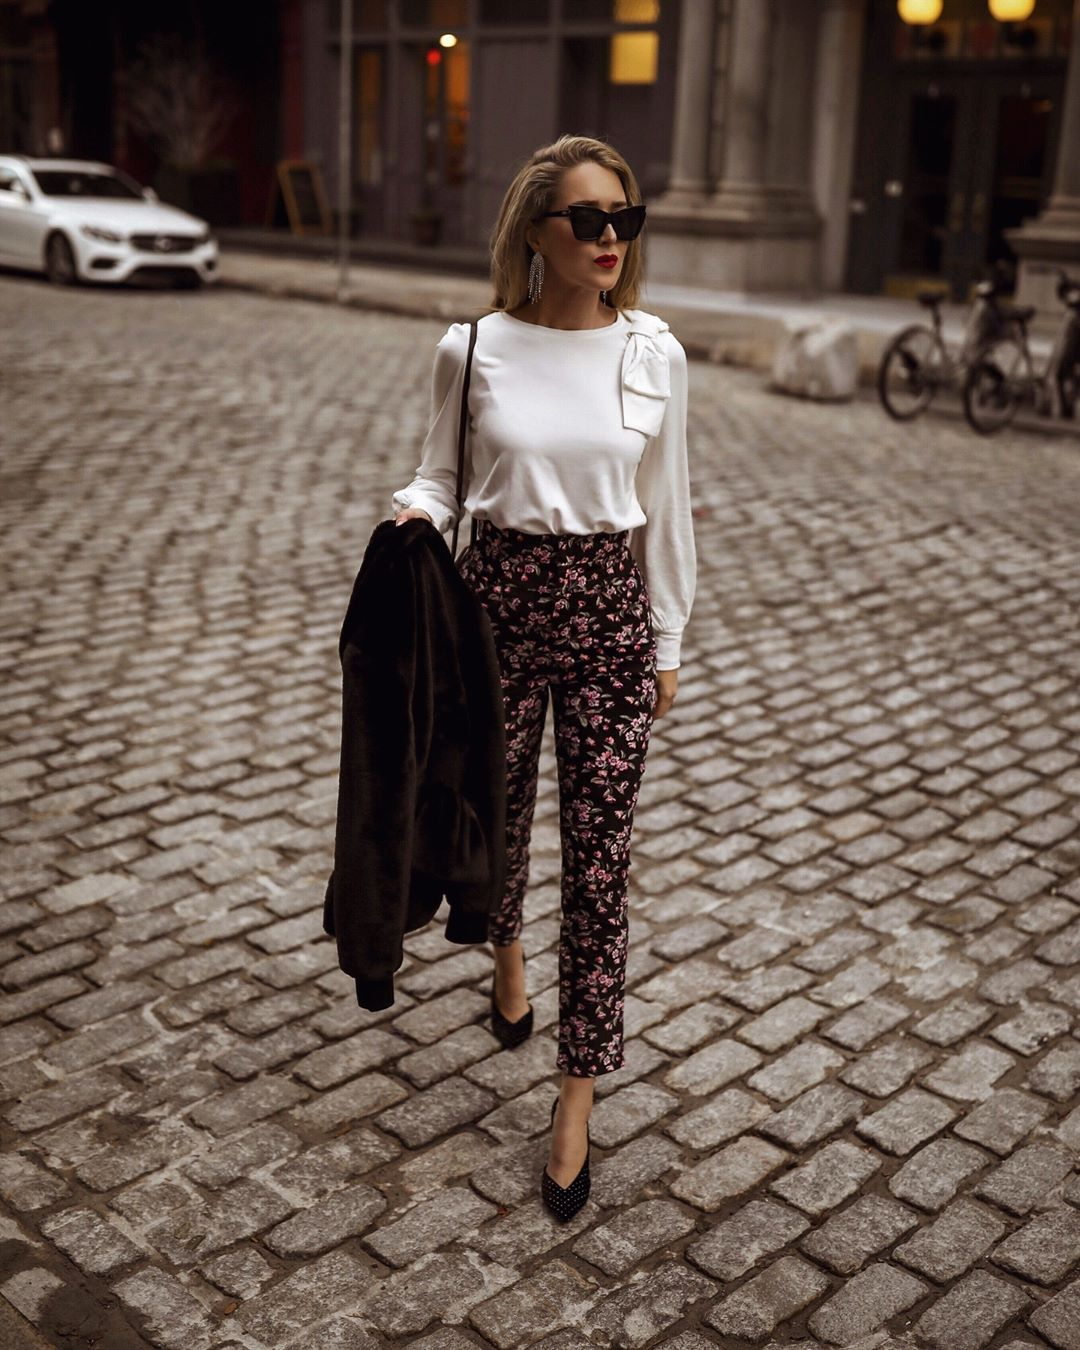 брюки женские 2019 фото 2